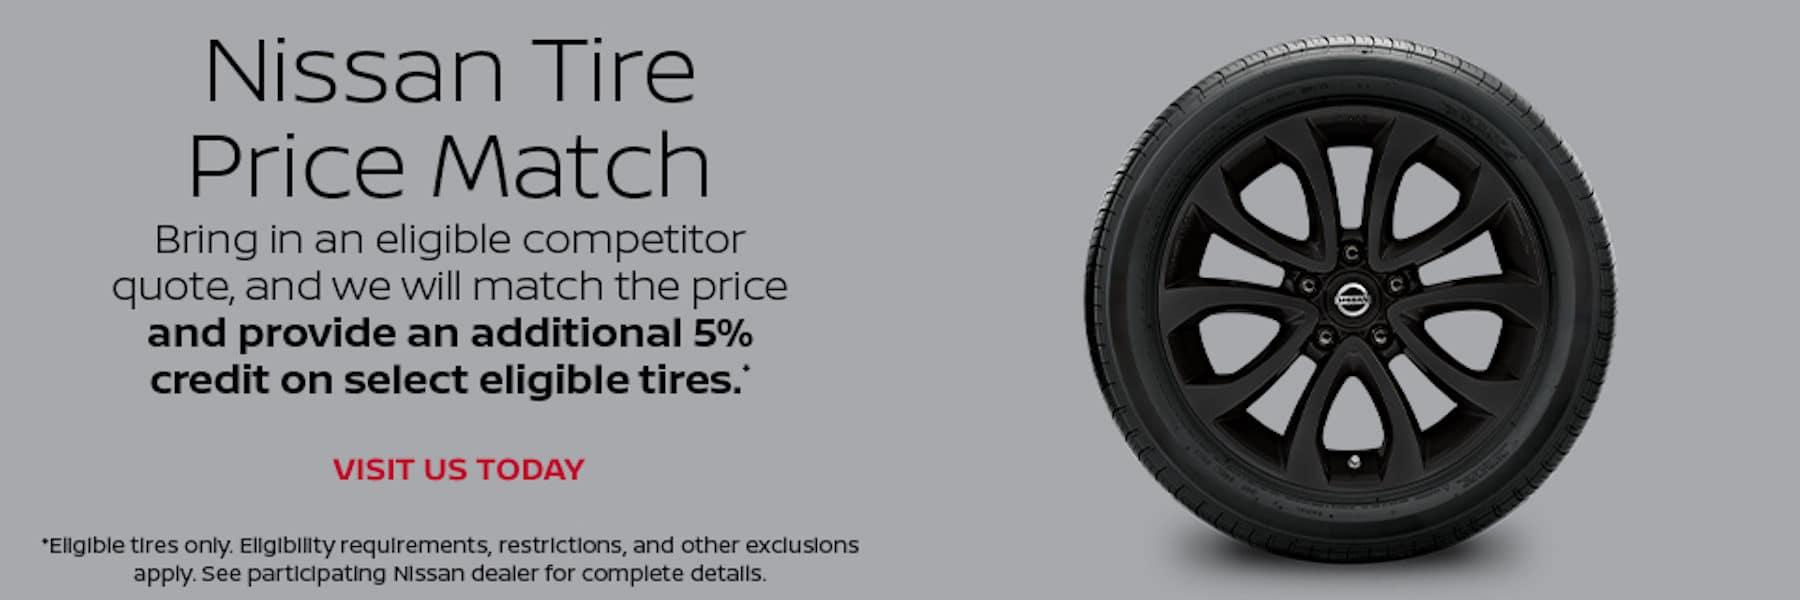 Port City Nissan Tire Price Match